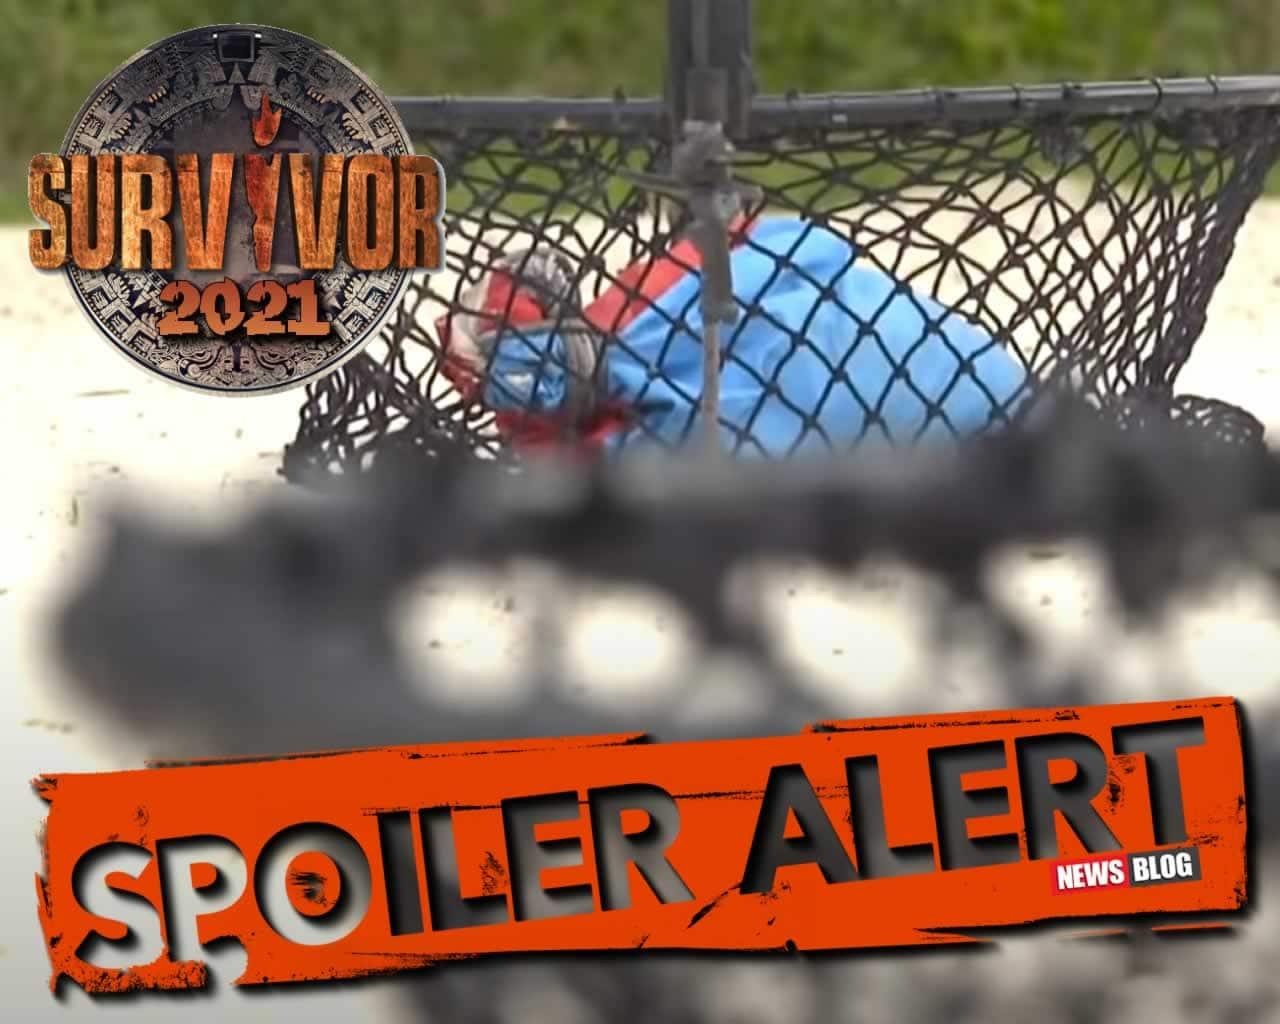 Survivor spoiler 24.02 διαρροή: Η Ανθή ΔΕΝ φεύγει! Εκτός παιχνιδιού η Ελευθερία;